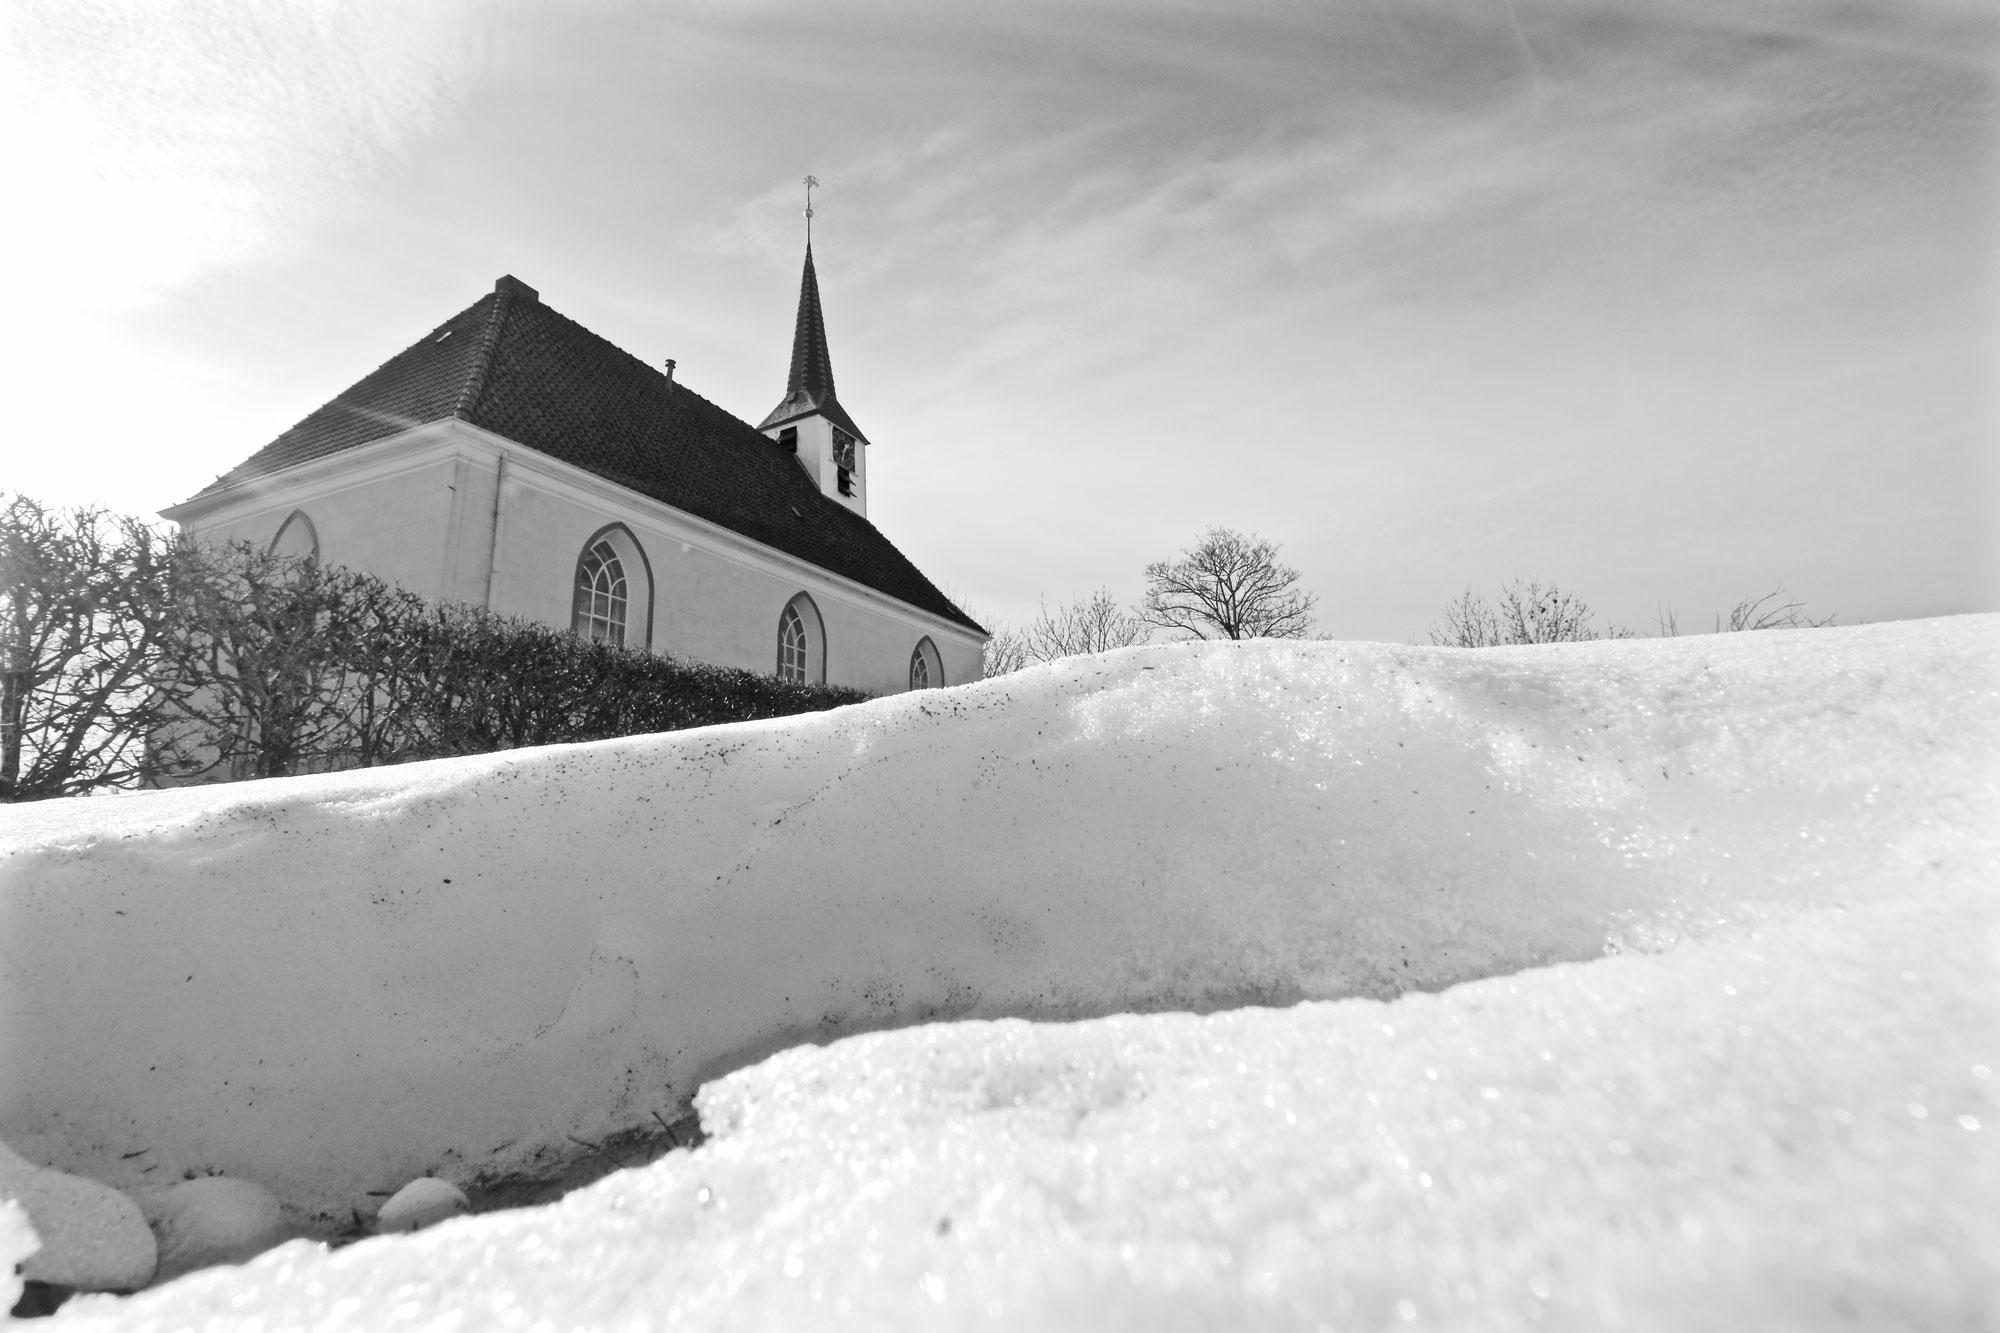 Winter in Stitswerd